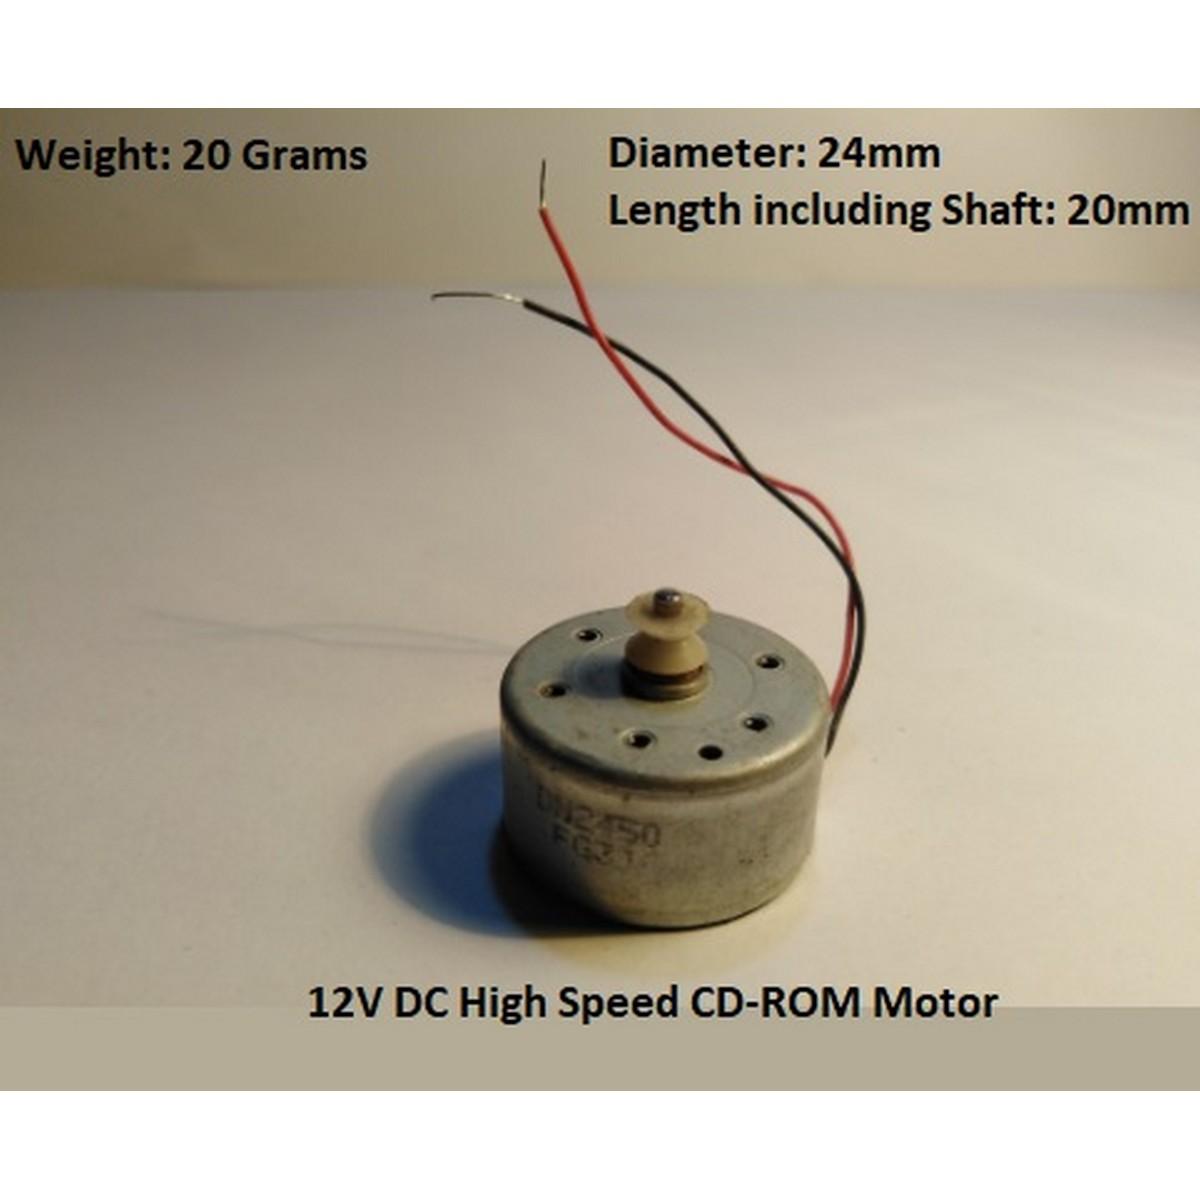 12V DC Motor for RC Car, Small Fan, Machines - CD ROM Motor